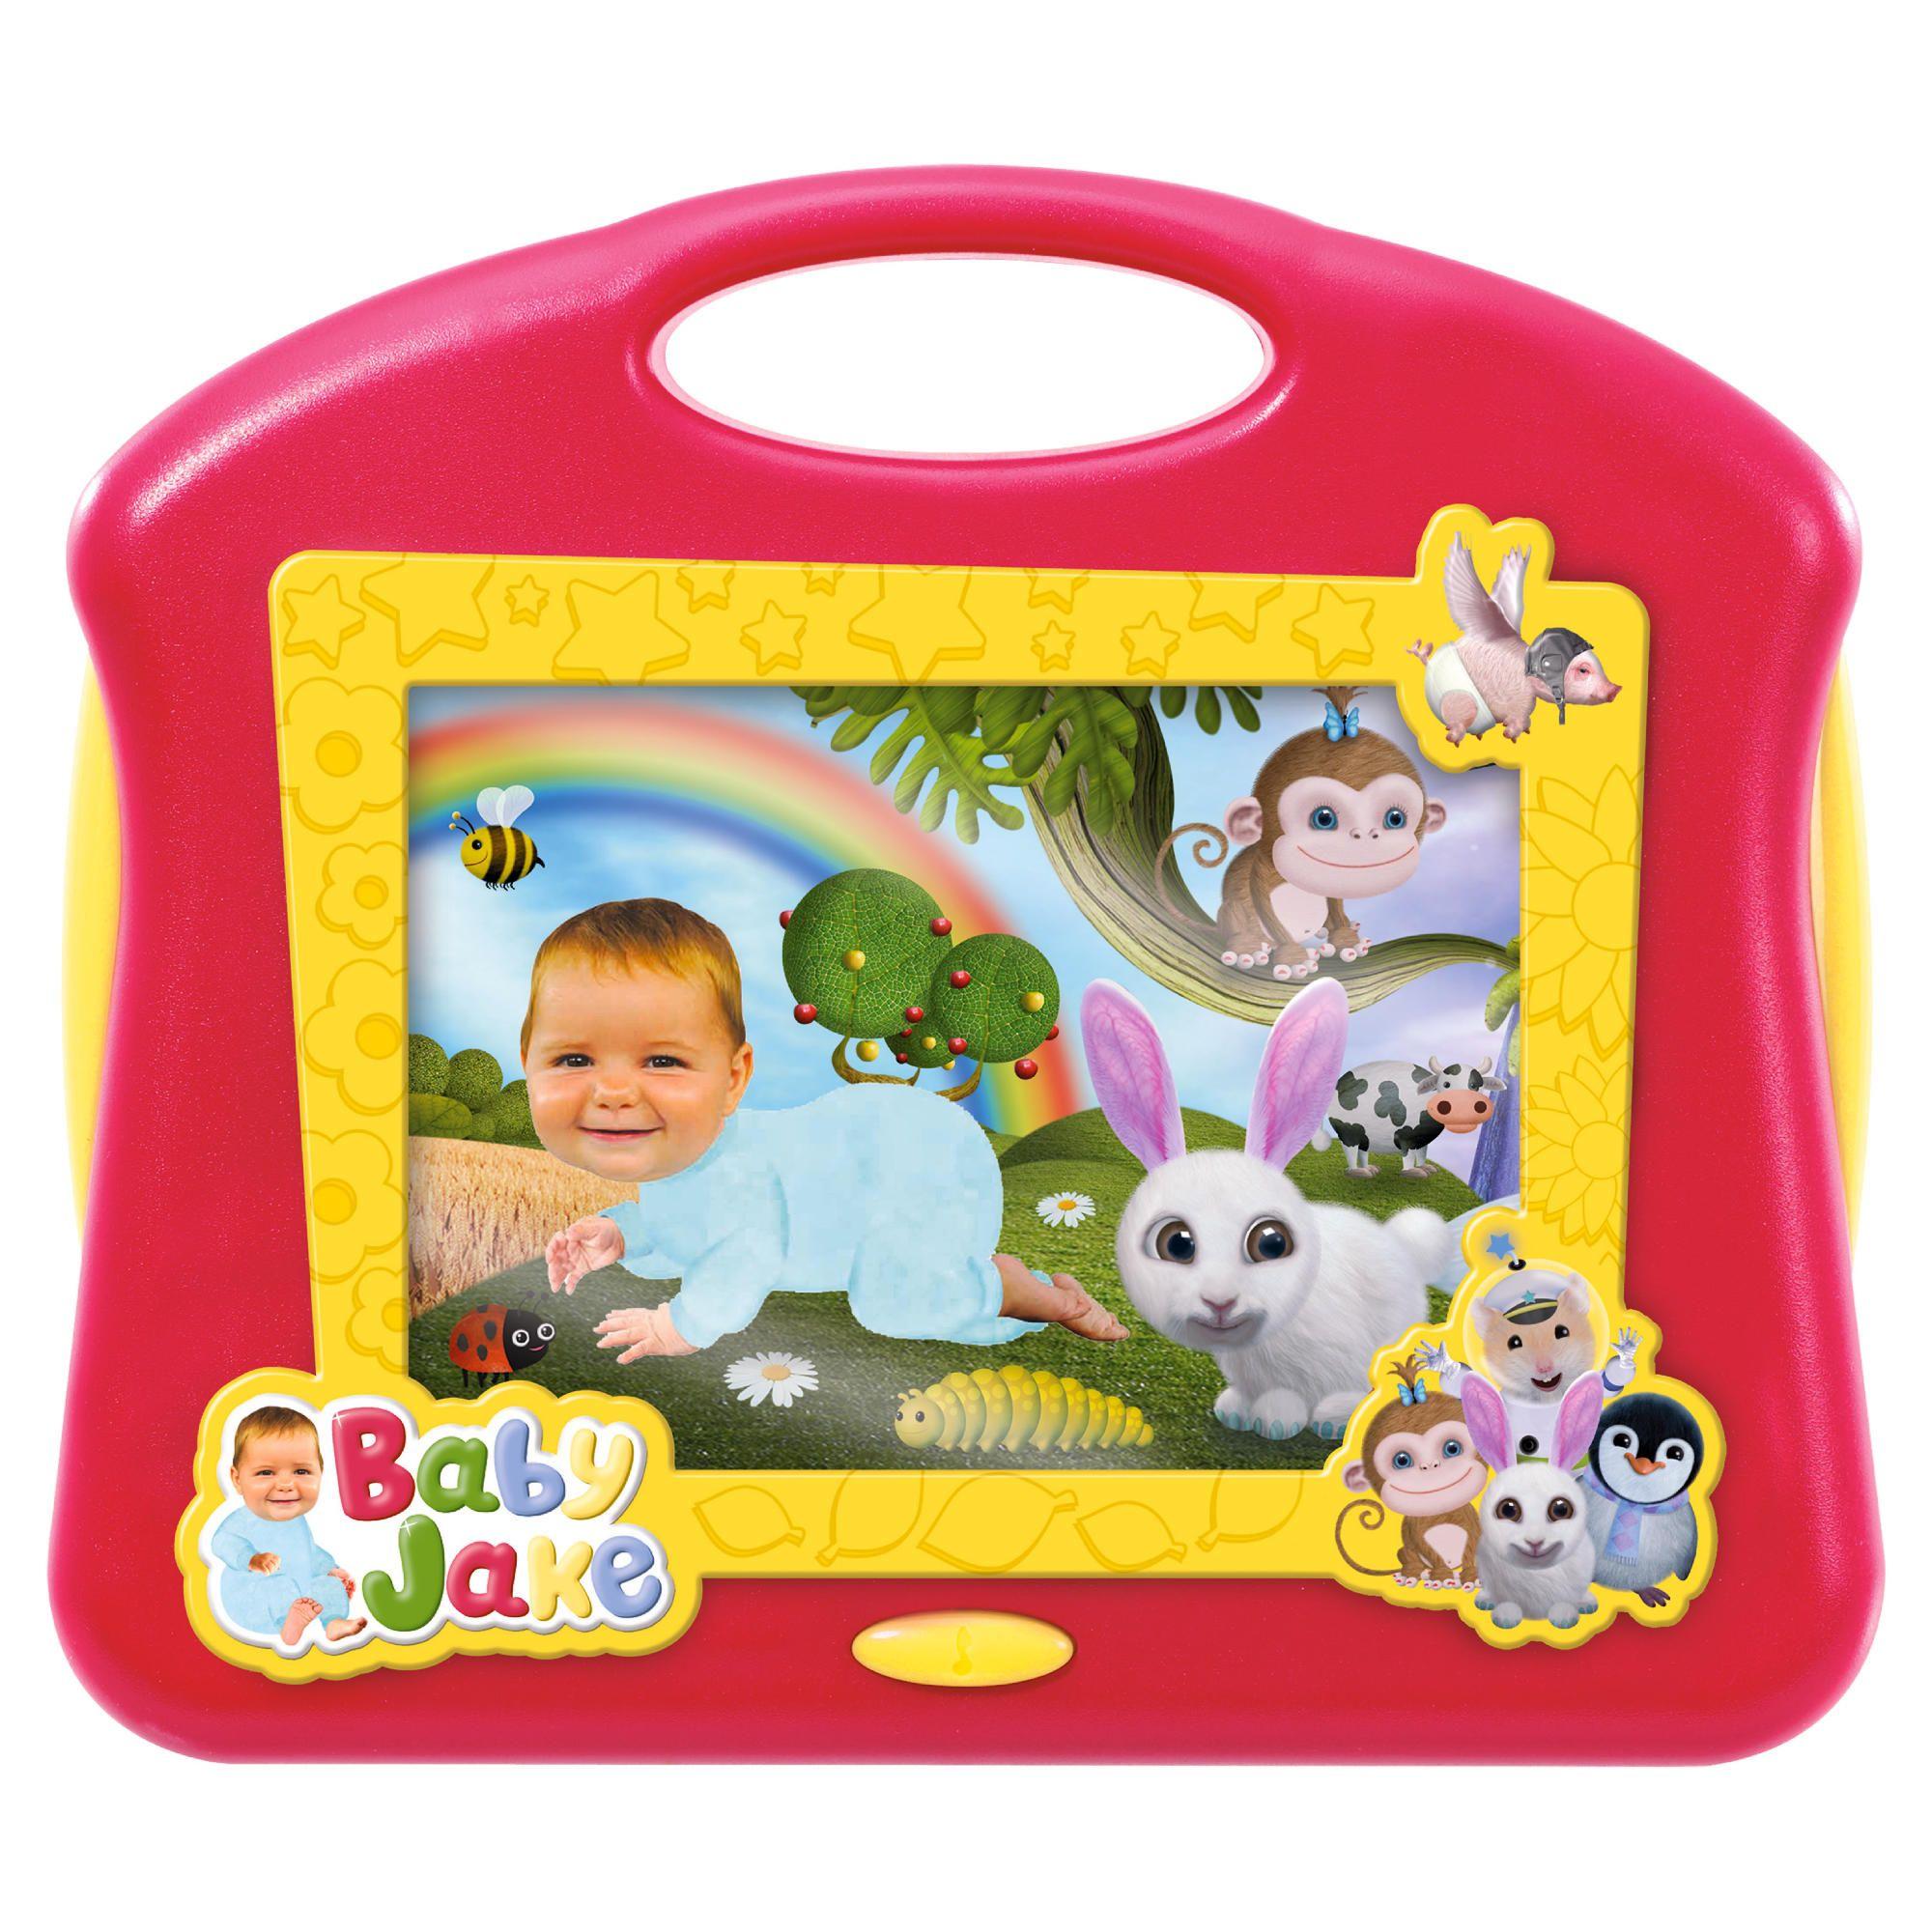 Baby Jake Toys | Toybuzz